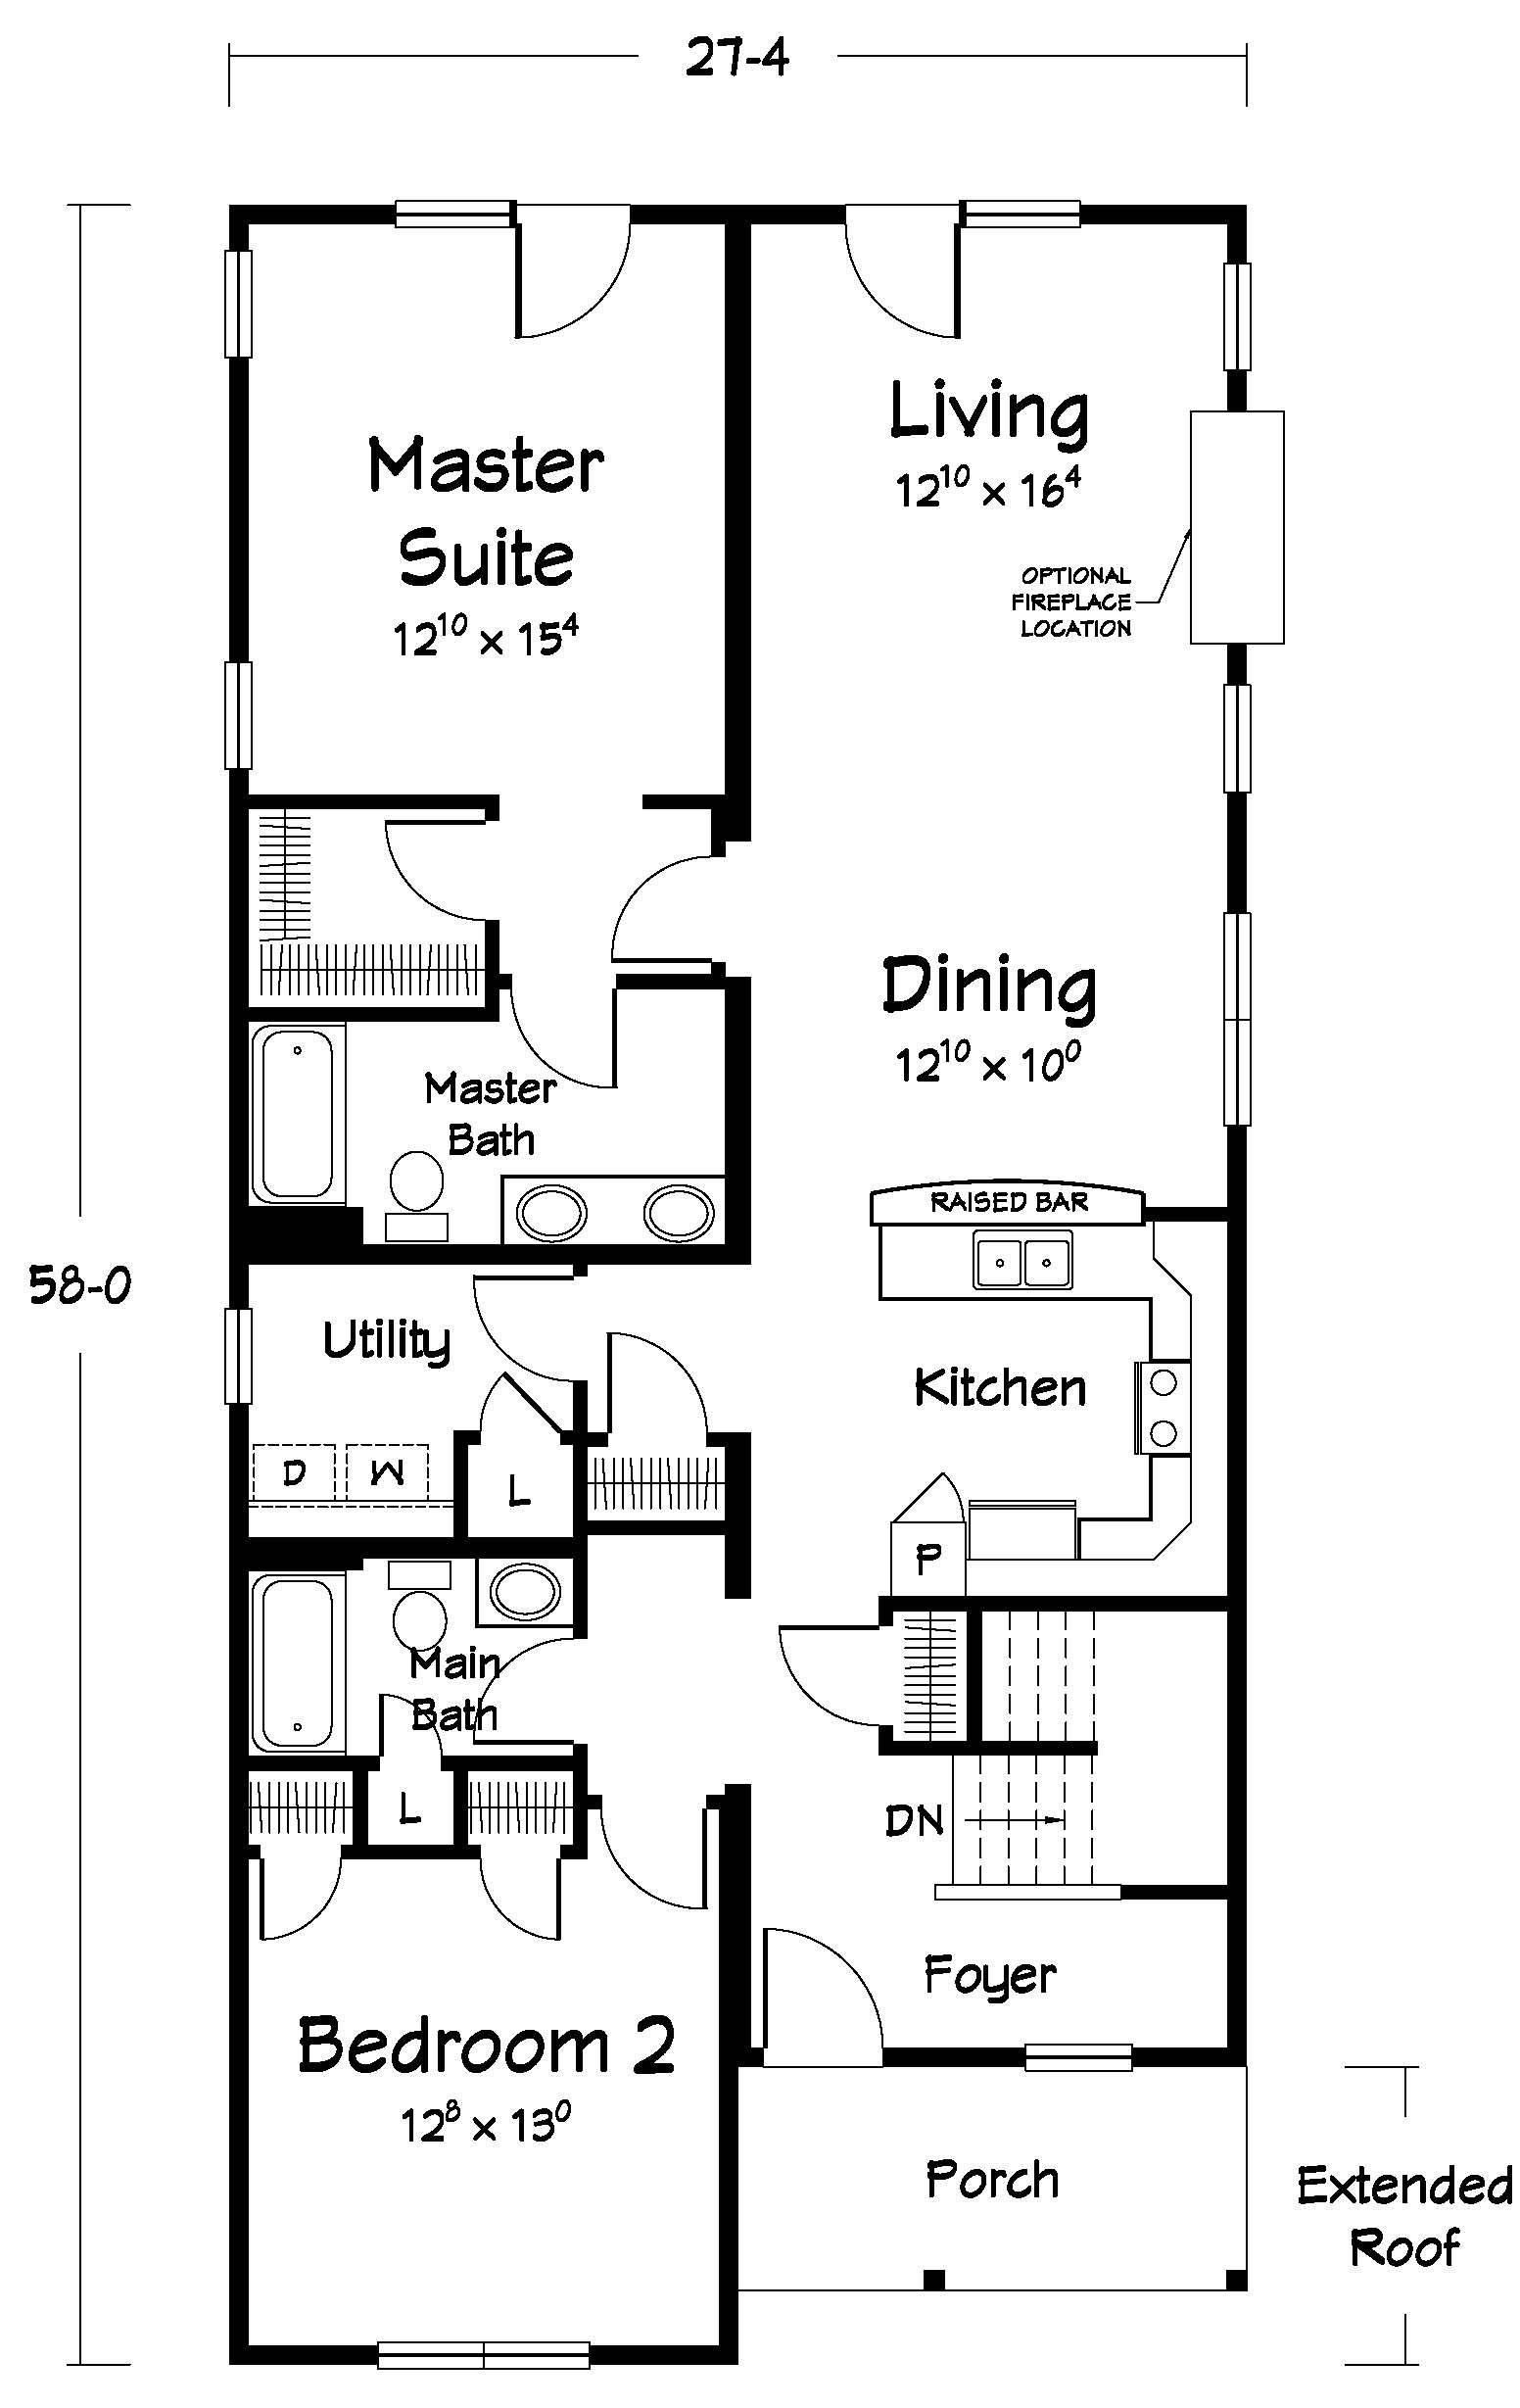 Floor Plans Modular Home Manufacturer Ritz Craft Homes Pa Ny Nc Mi Nj Maine Me Nh Vt Modular Home Plans Bungalow Style House Plans Modular Homes